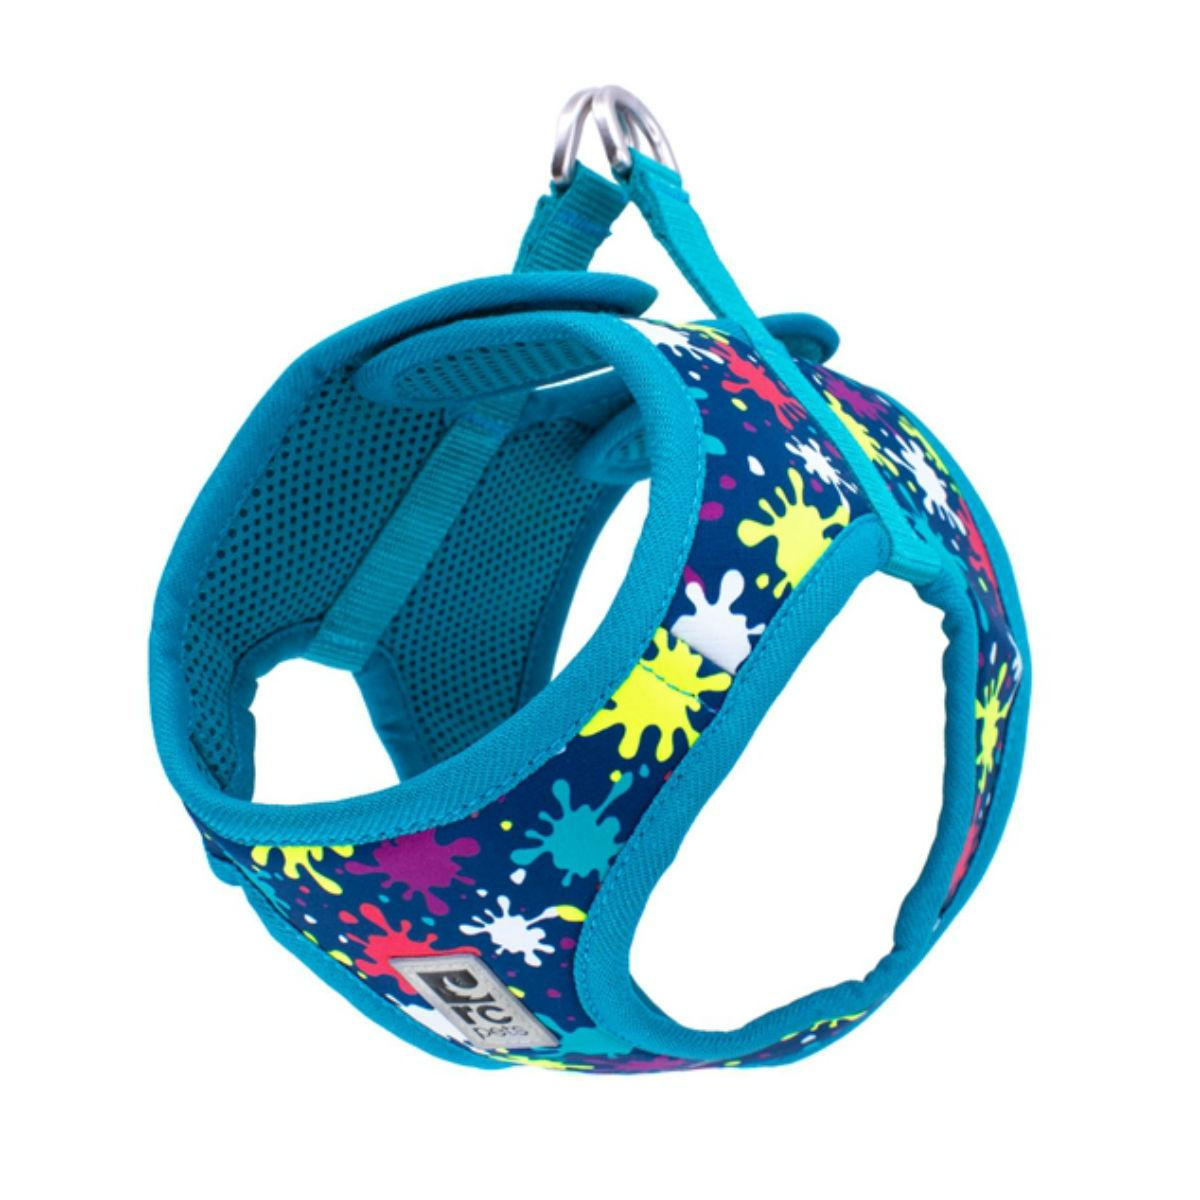 Step-in Cirque Dog Harness - Splatter